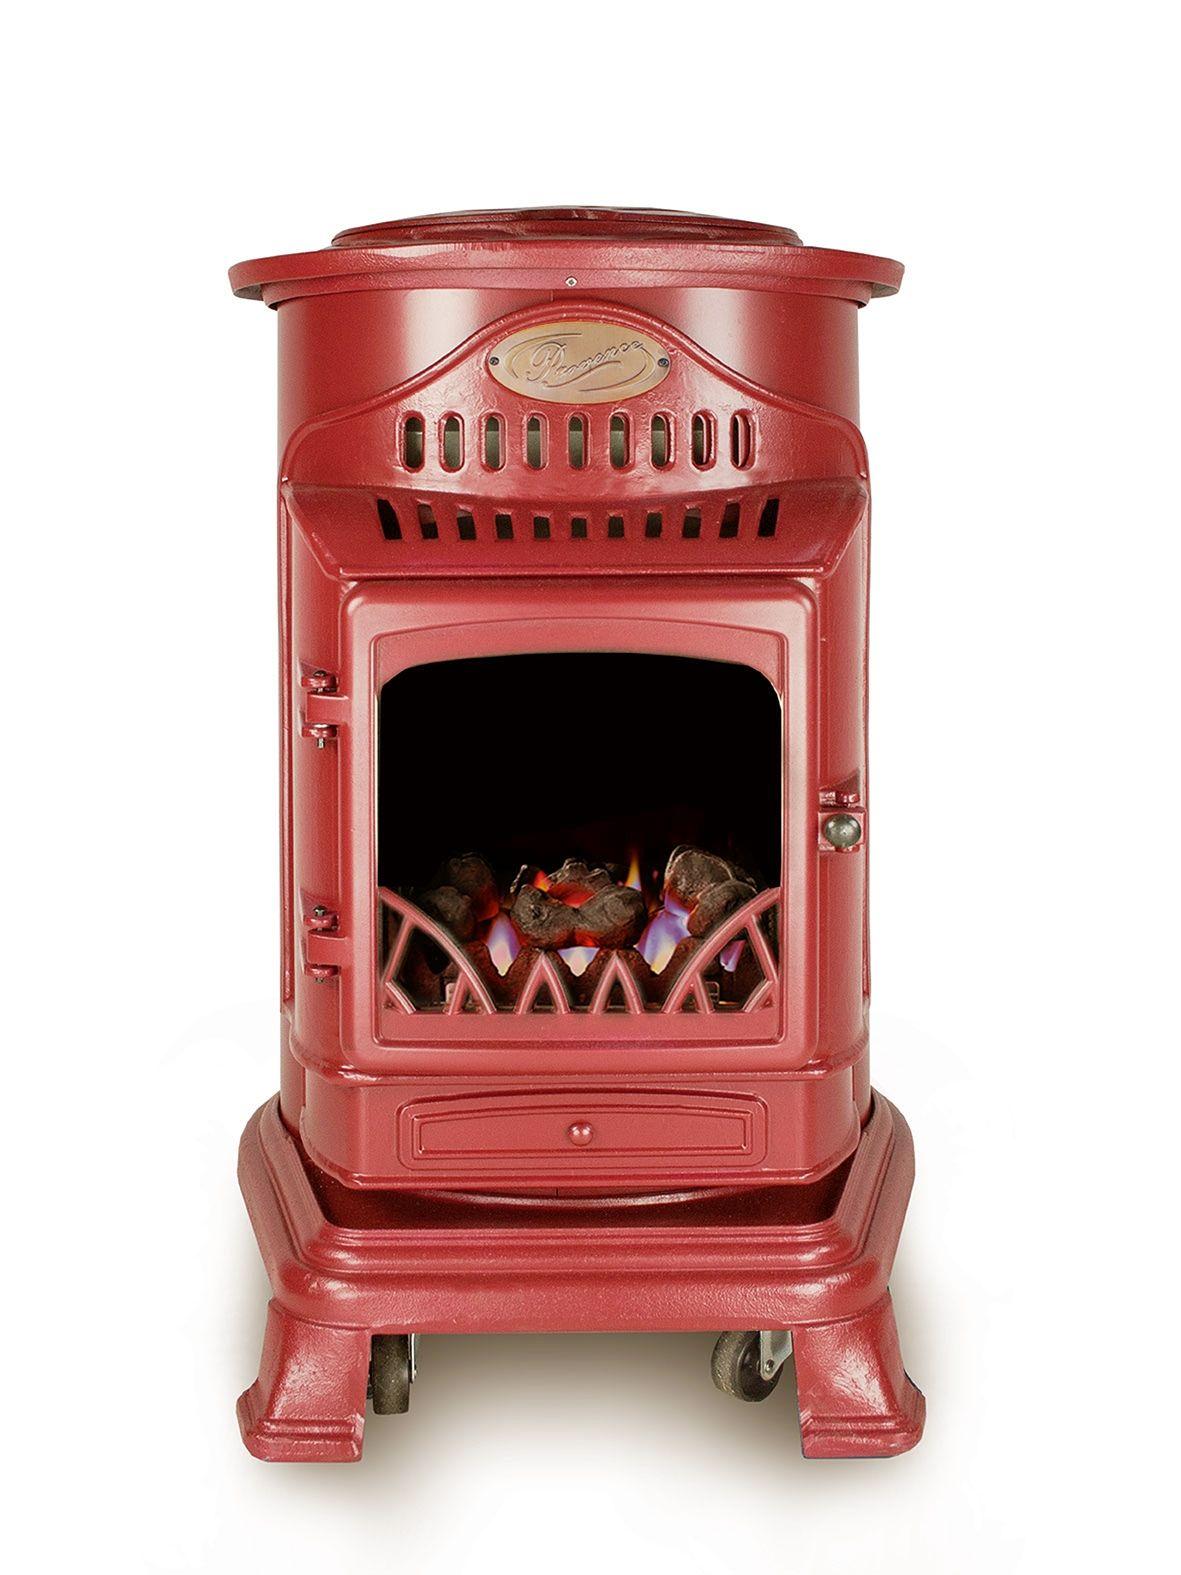 Estufa De Gas Portatil Modelo Provence Color Rojo Retro Chimeneas De Gas Chimeneas Estufas De Lena